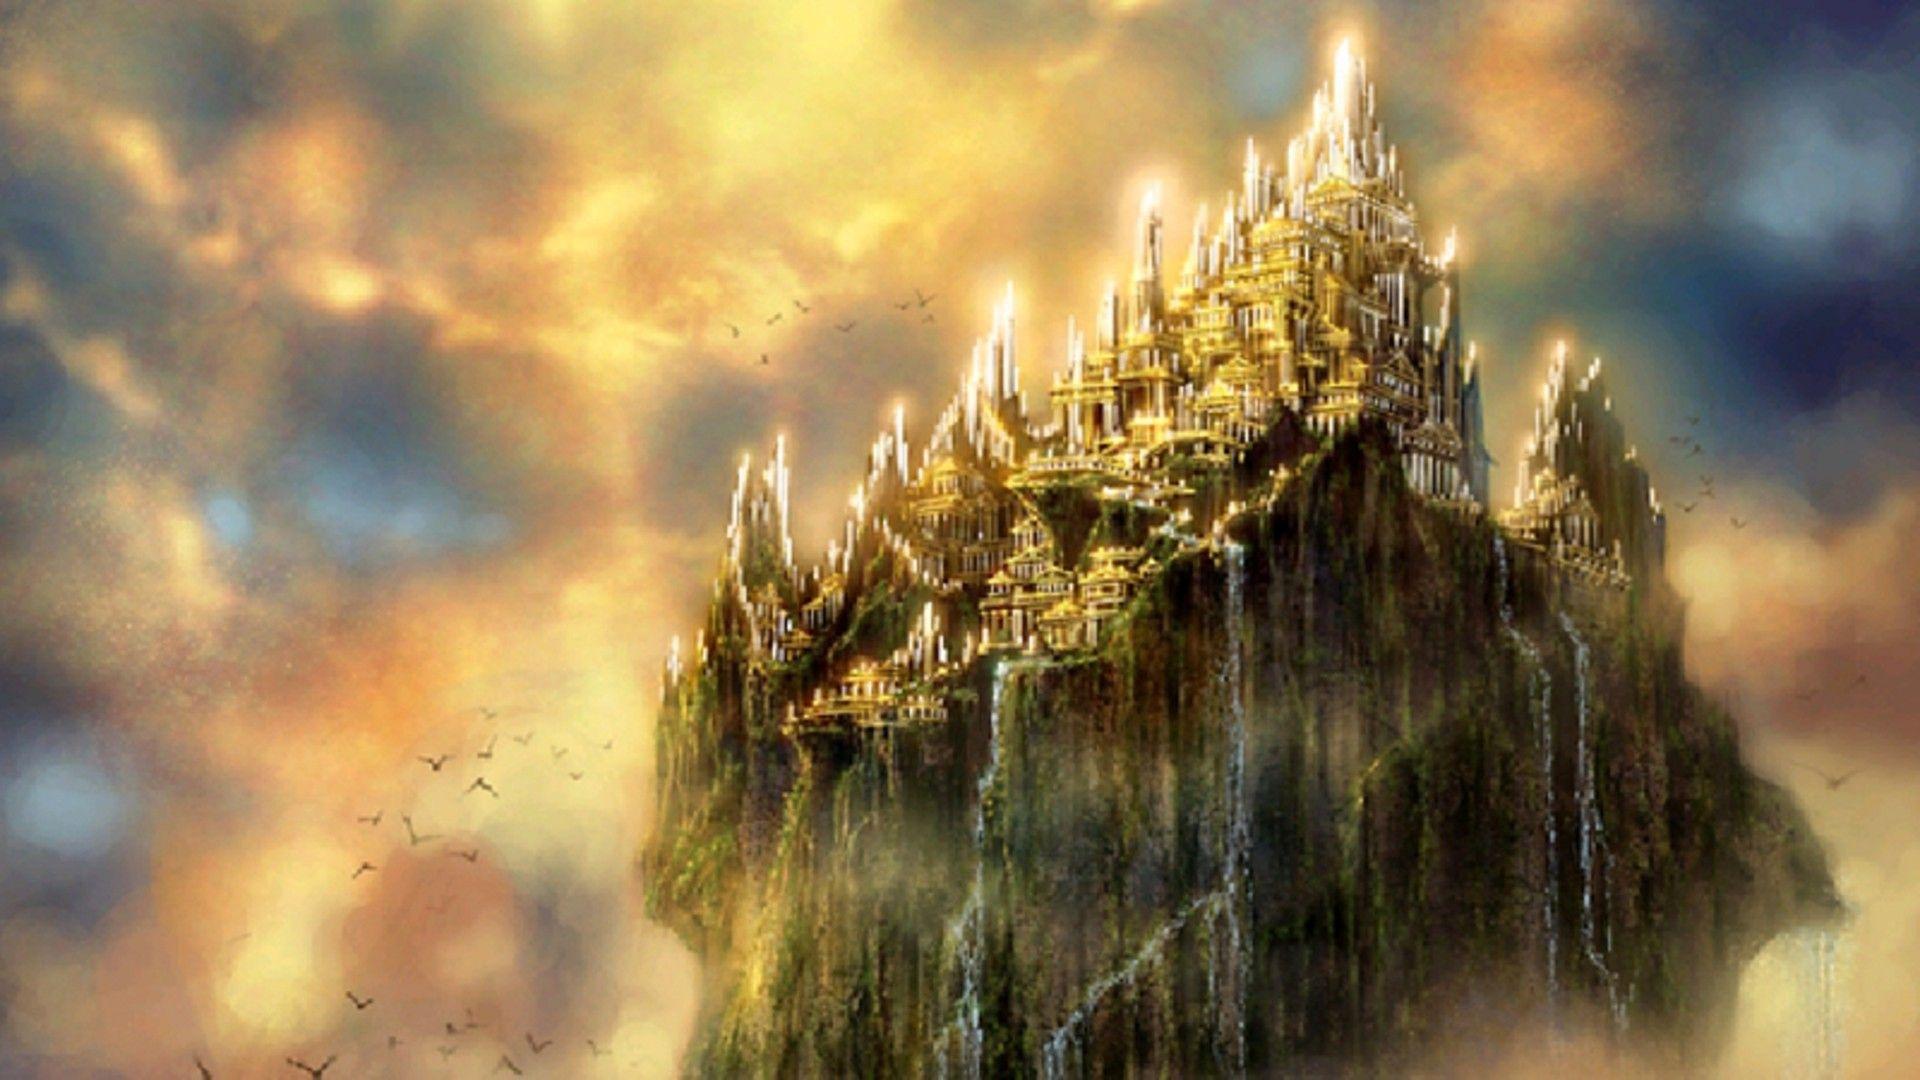 FANTASY CASTLES | castles fantasy wallpapers castle wallpaper images 1920x1080